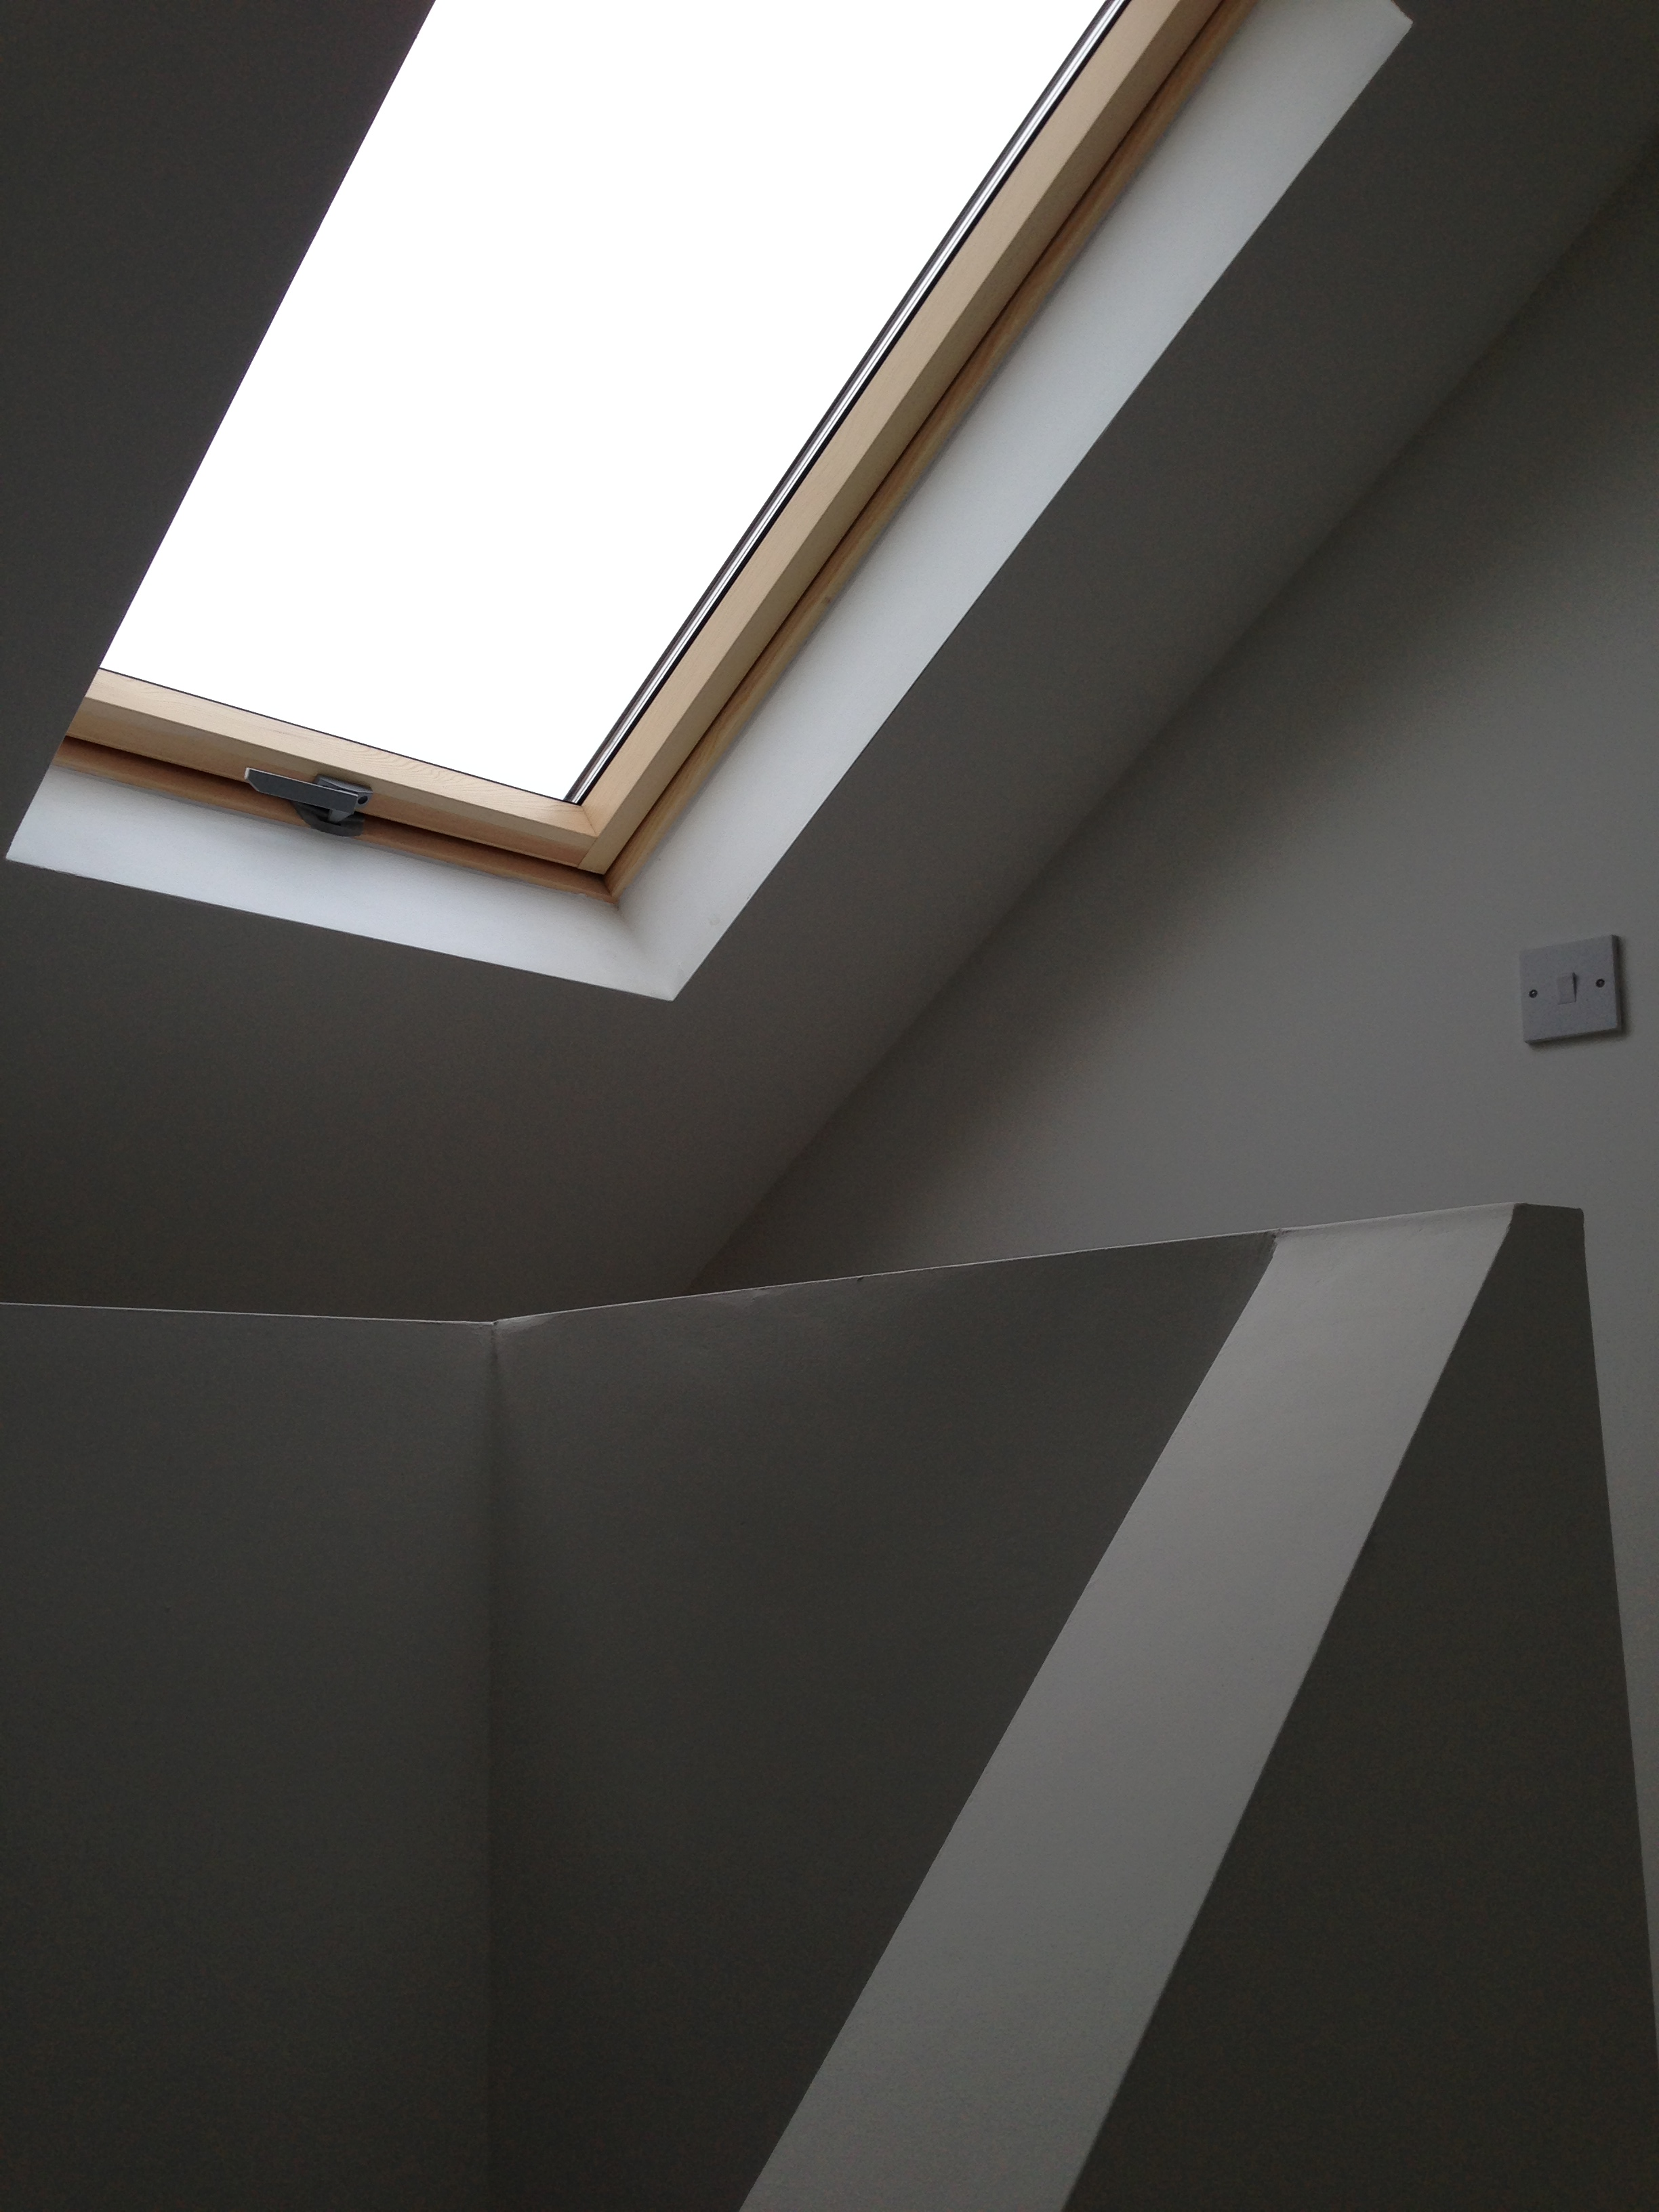 Rooflight Windows Velux Fakro Surehome Ie Building Contractors Dublin Kildare And Leinster